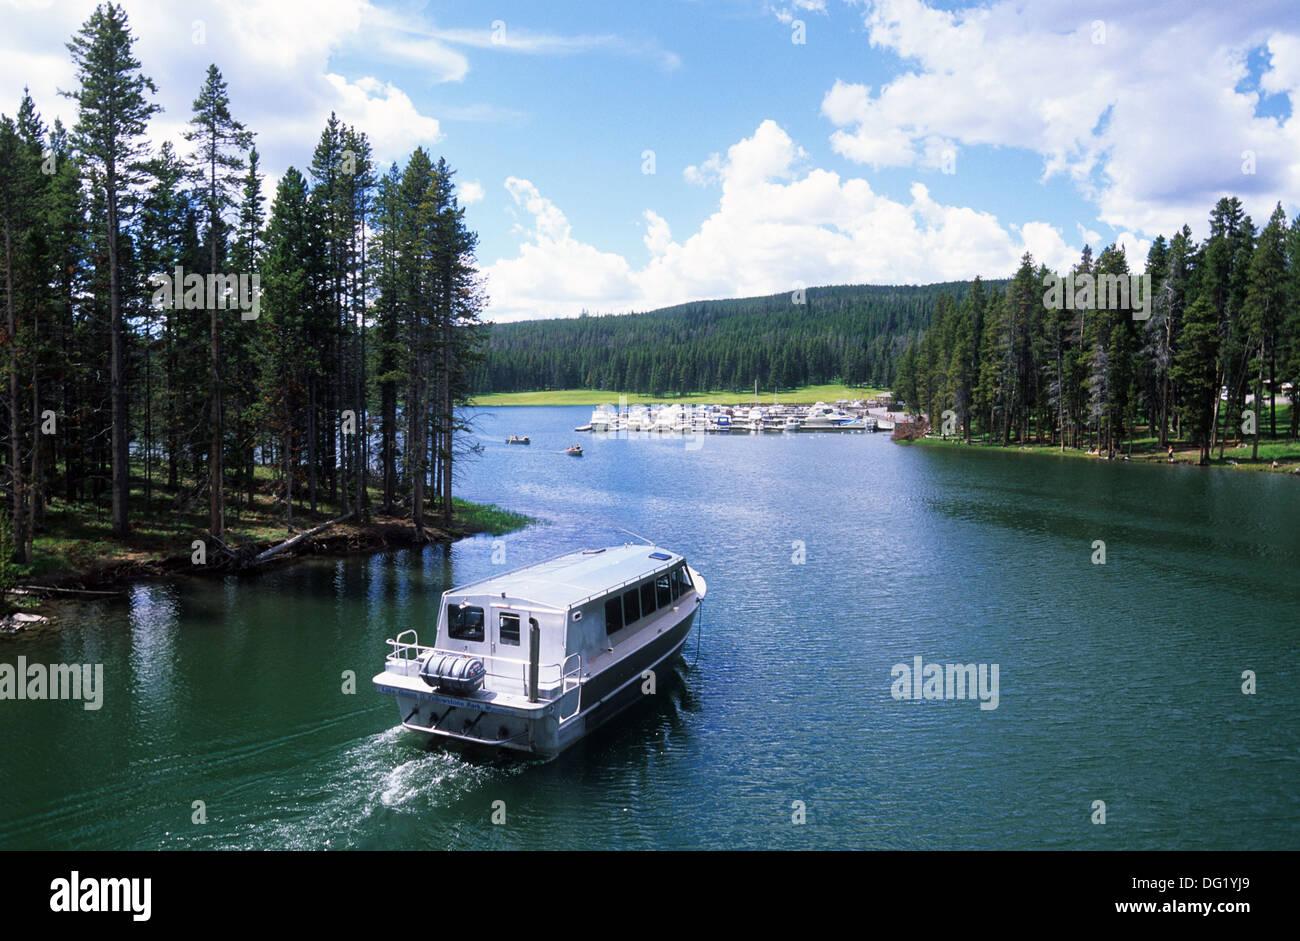 Elk265-2470 Wyoming, Yellowstone National Park, Yellowstone Lake, tour boat at Bridge Bay - Stock Image